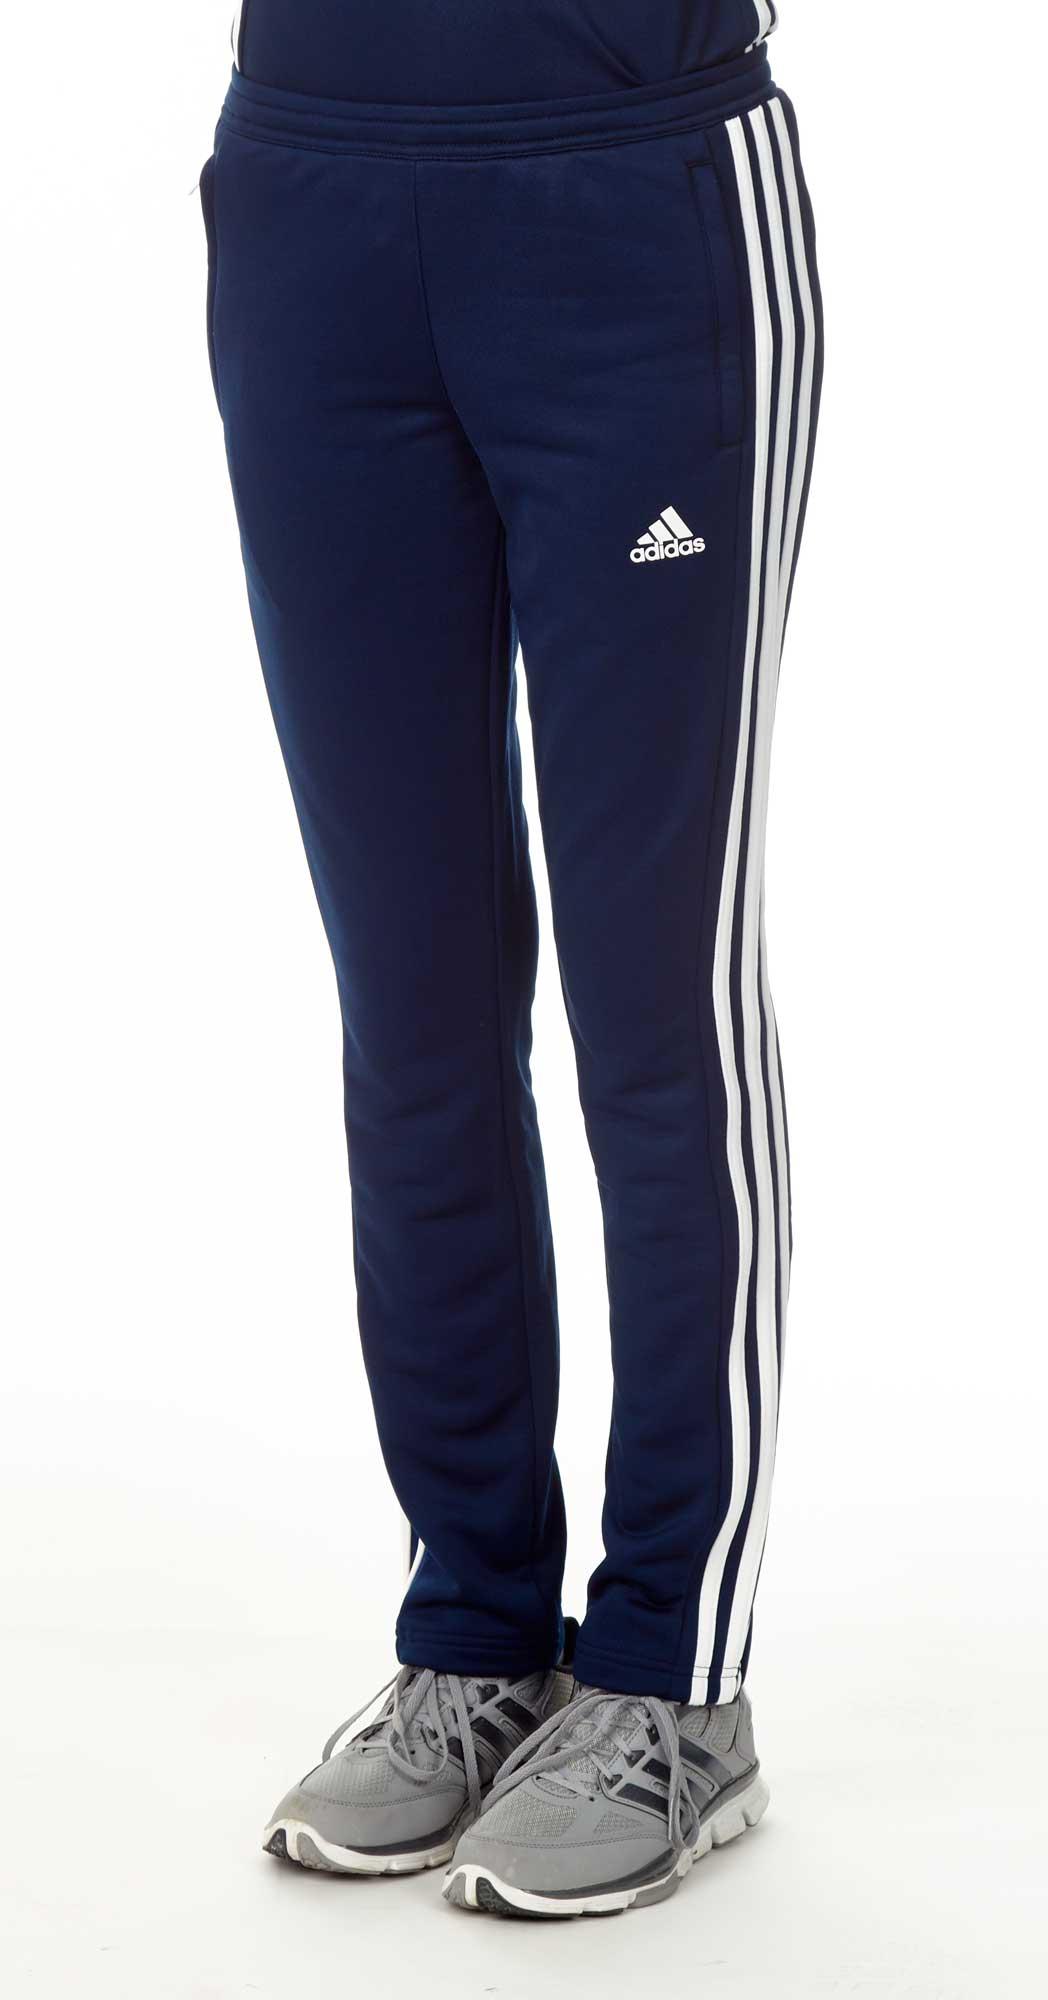 2019 Neupreis wo zu kaufen Sonderverkäufe adidas T16 Team Sweat Hose Damen navy blau /weiß AJ5391